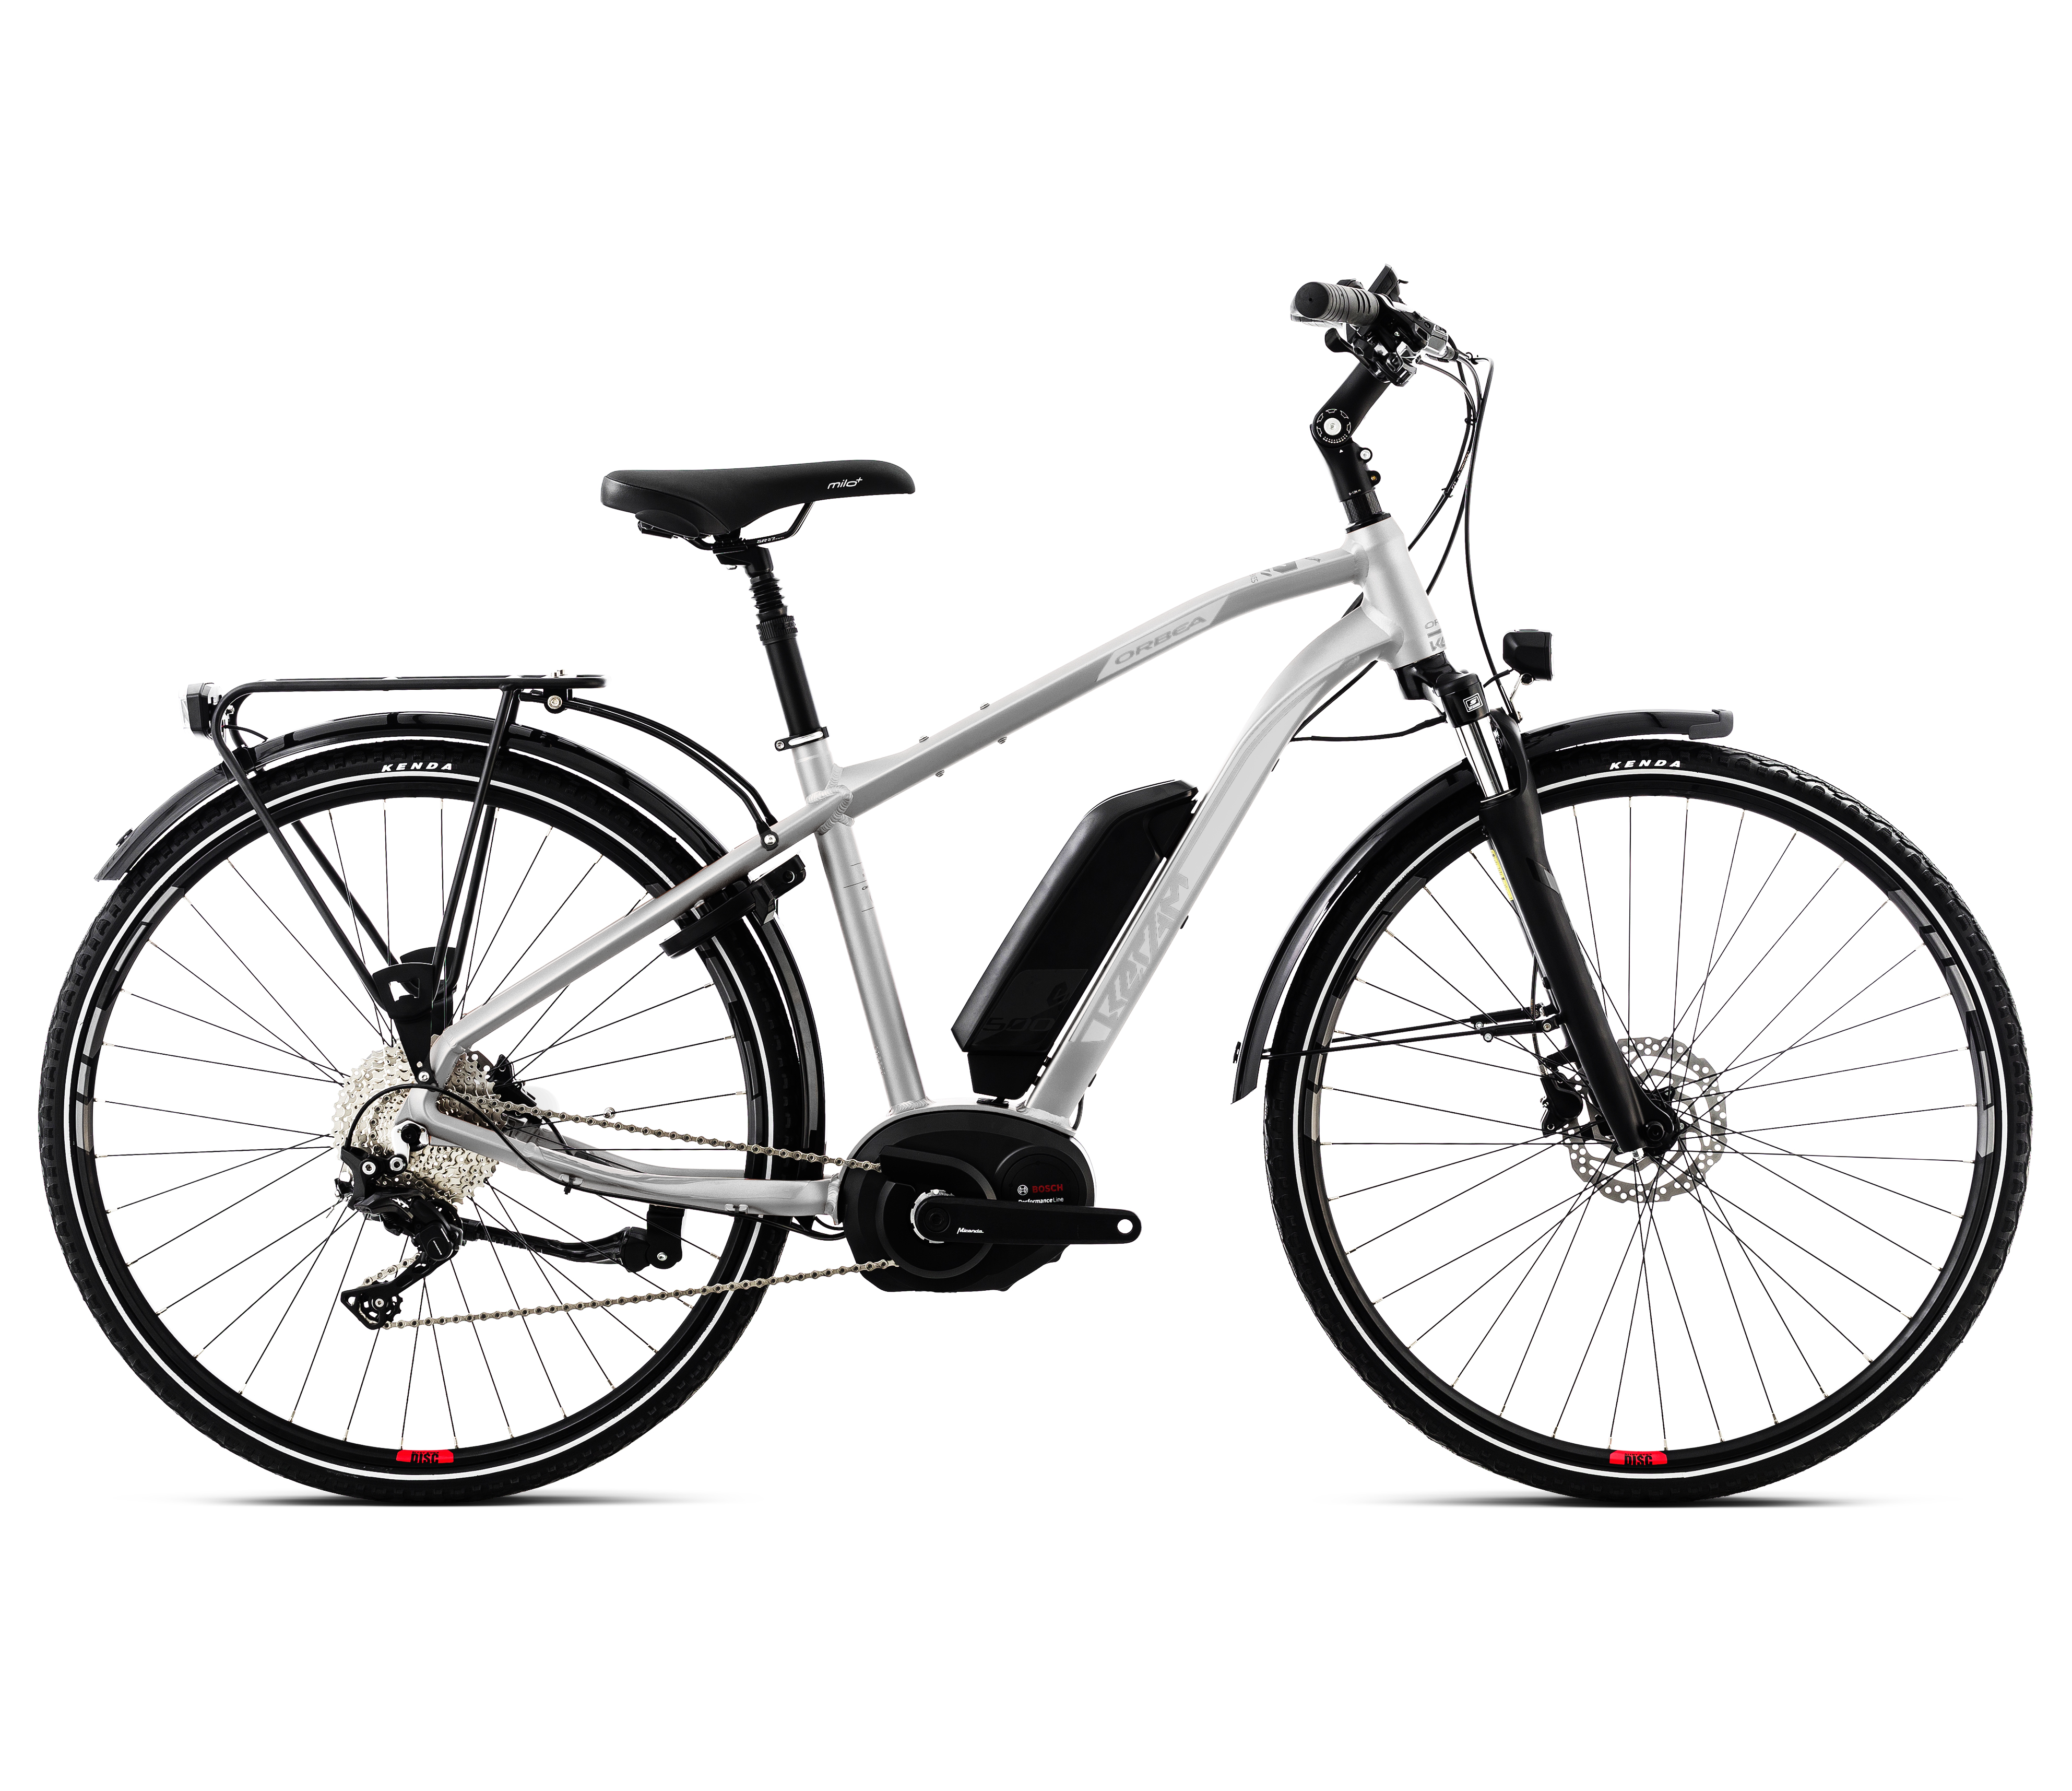 orbea versand orbea e bike keram comfort 10 online kaufen. Black Bedroom Furniture Sets. Home Design Ideas